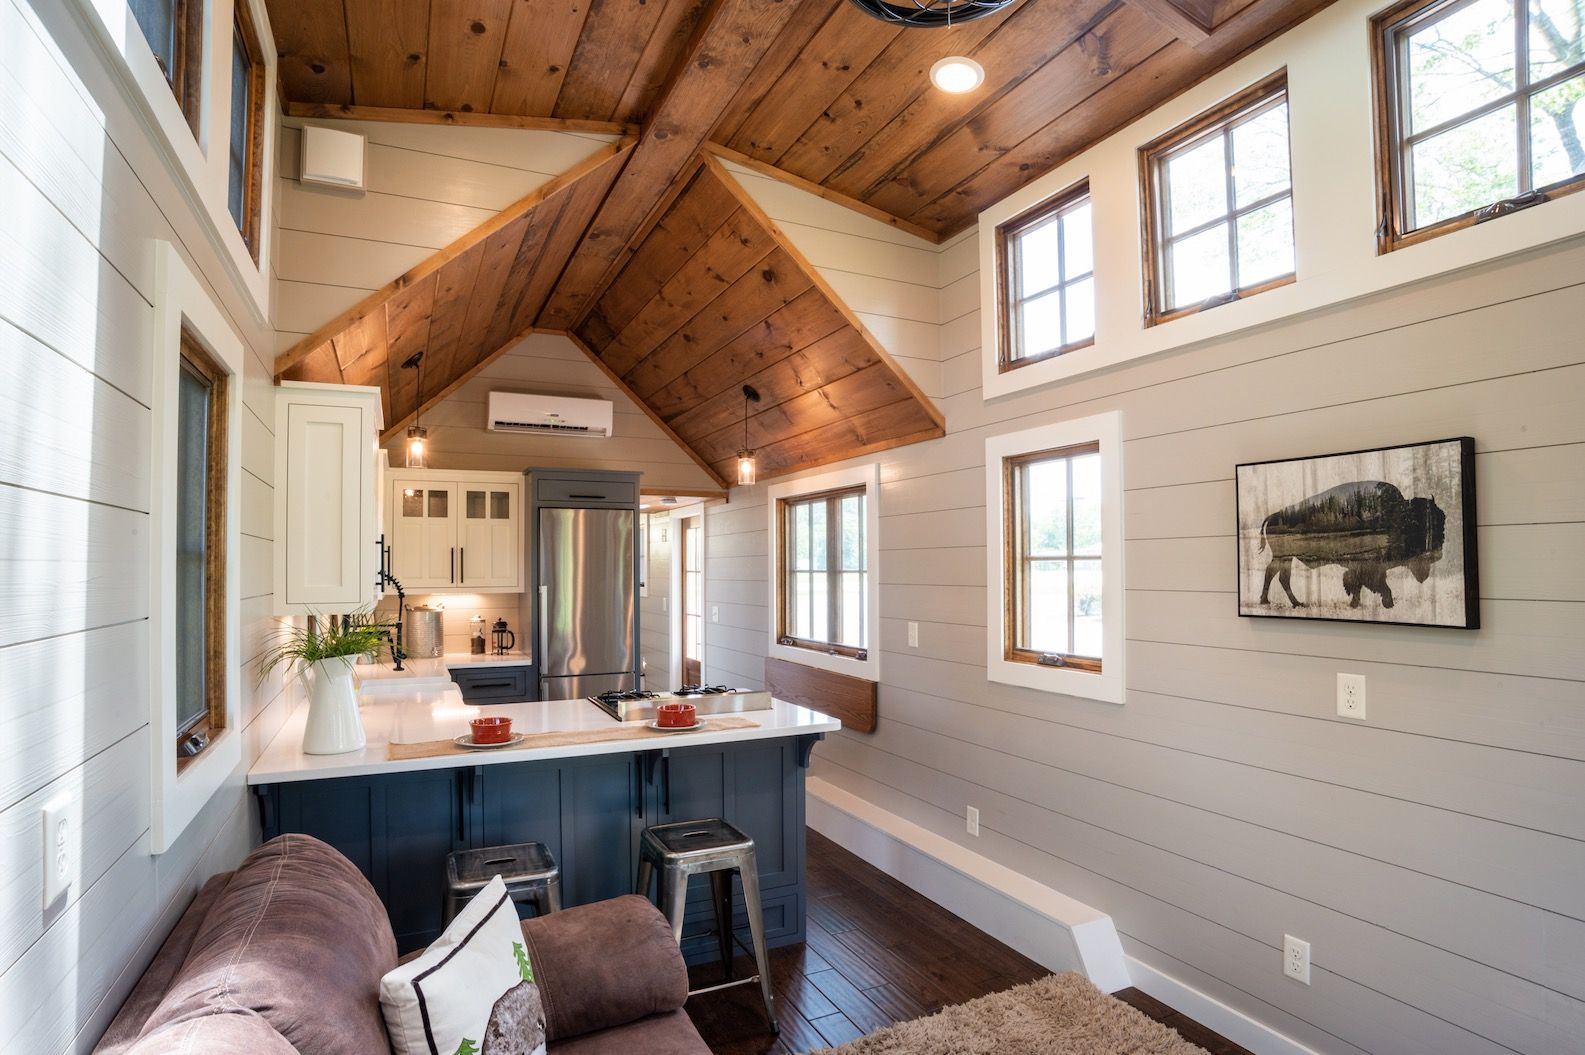 42ft Denali Xl Tiny House By Timbercraft Tiny Homes 003